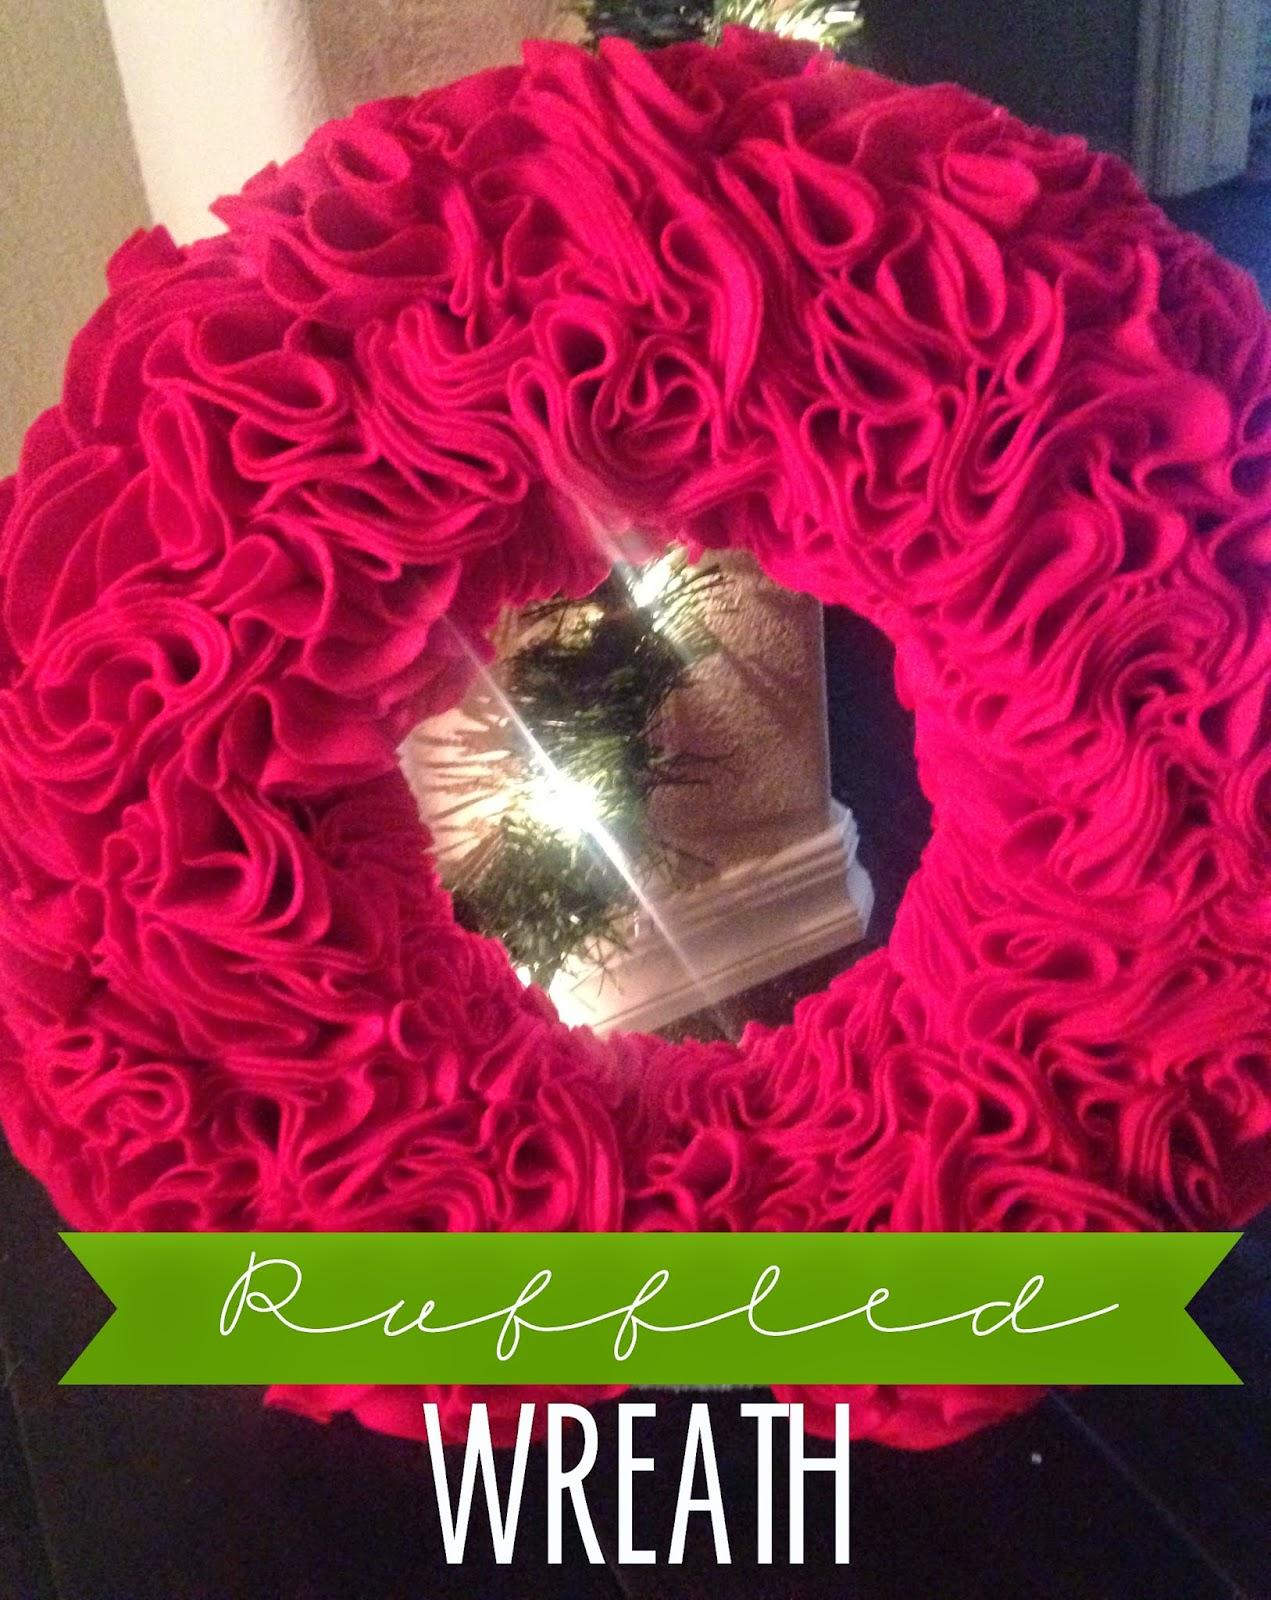 http://thenewmrsadventures.blogspot.com/2014/12/ruffled-wreath-diy.html#.VKjTEN5Z-uc